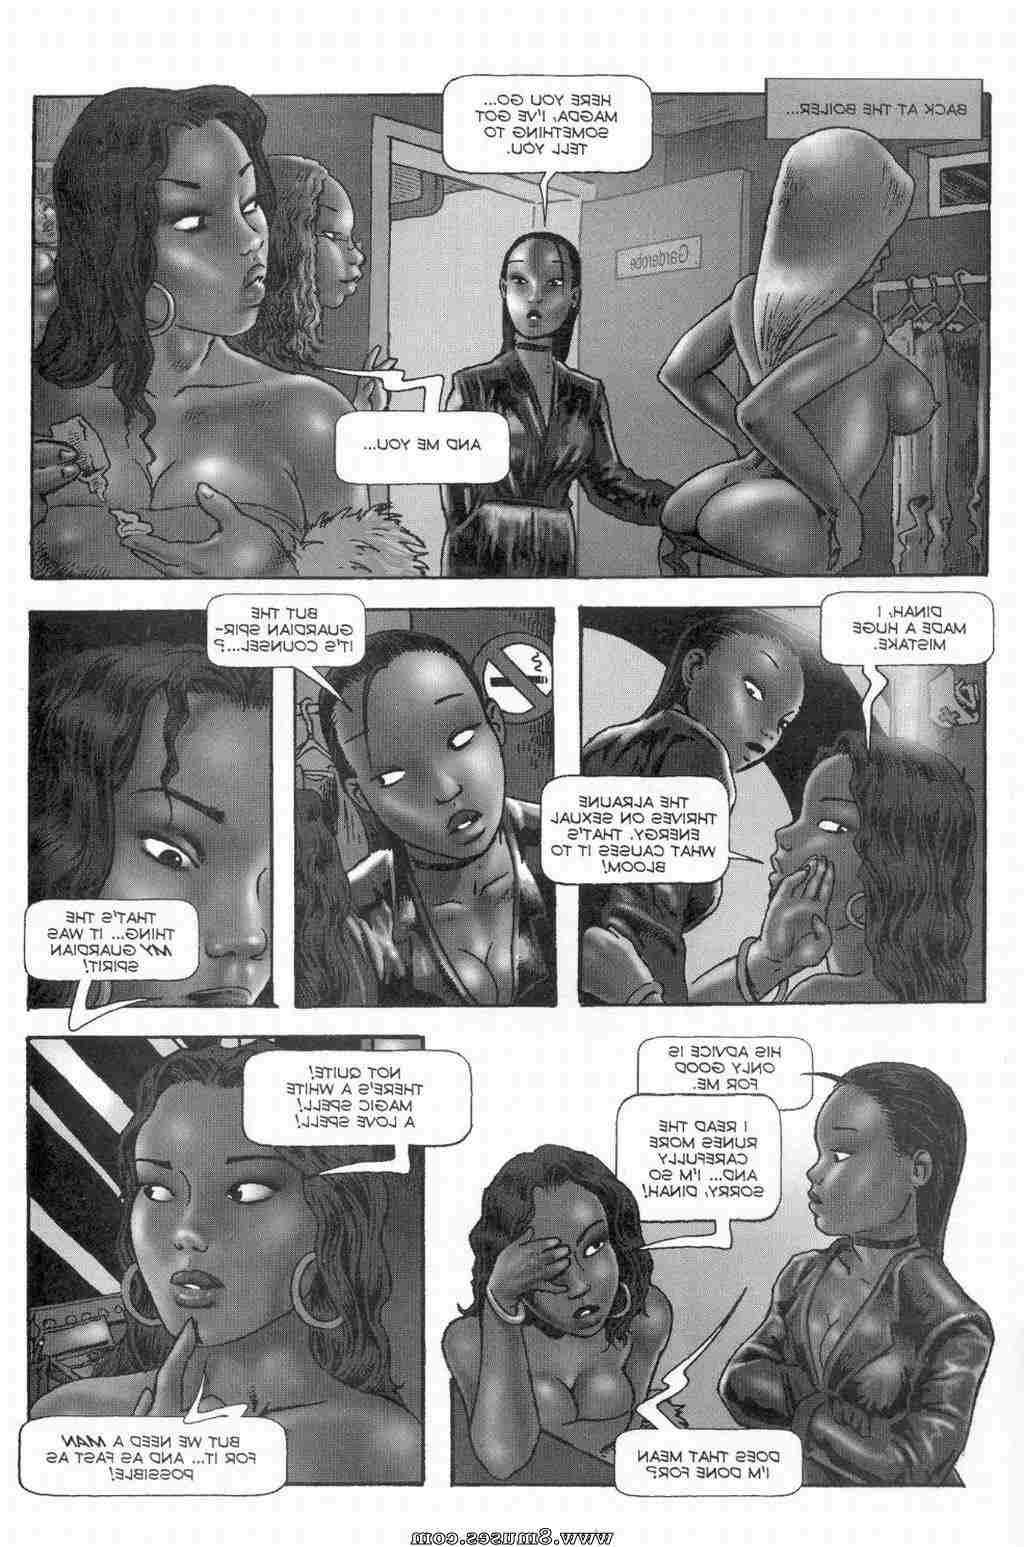 EROS-Comics/Alraune/Alraune-06 Alraune_06__8muses_-_Sex_and_Porn_Comics_18.jpg